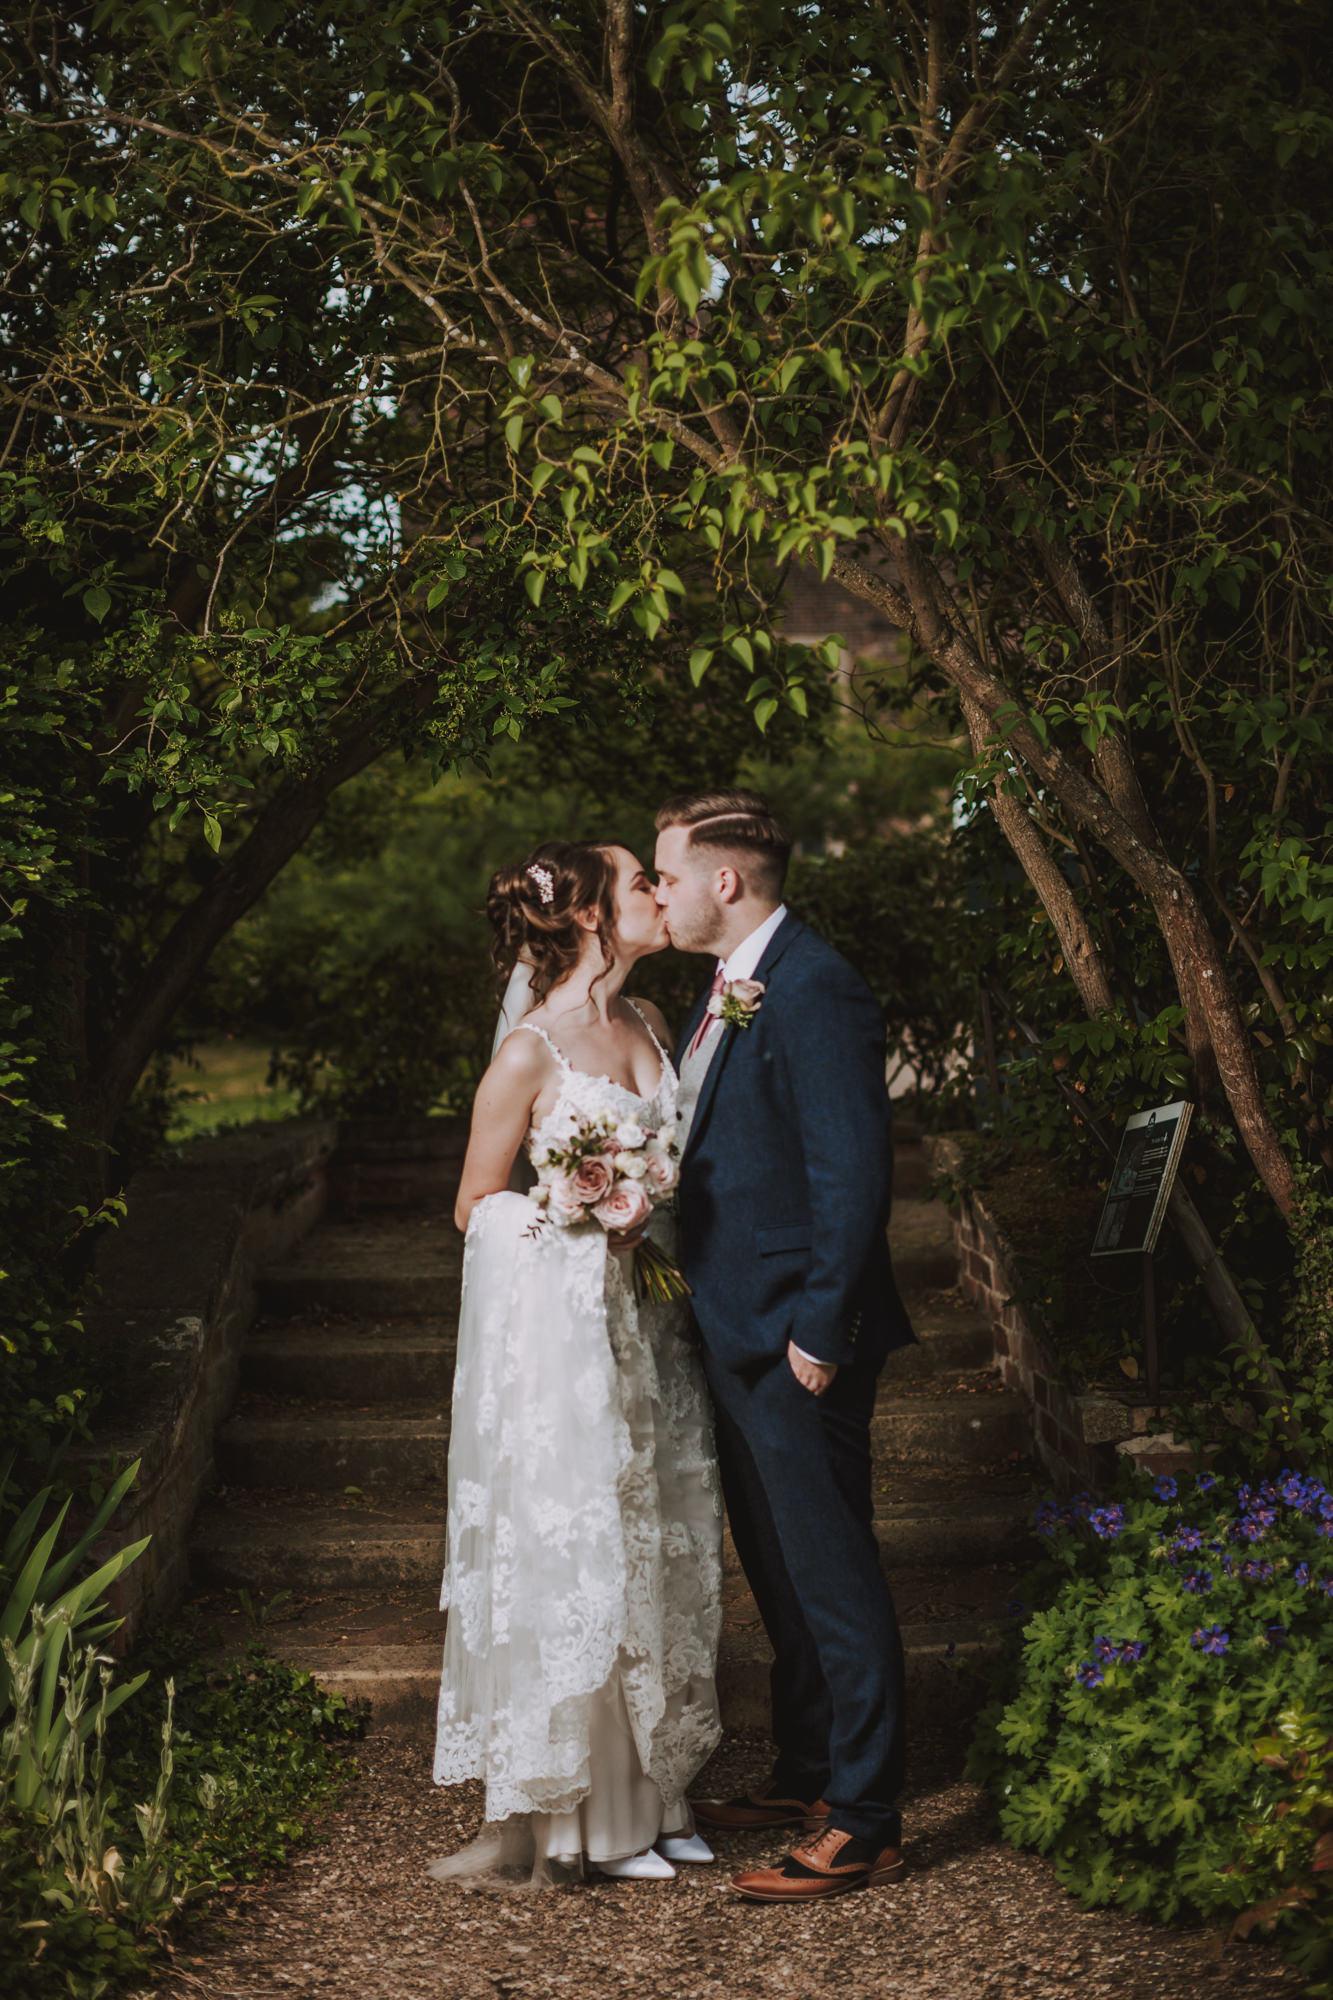 hodsock priory wedding photographers blog56.jpg